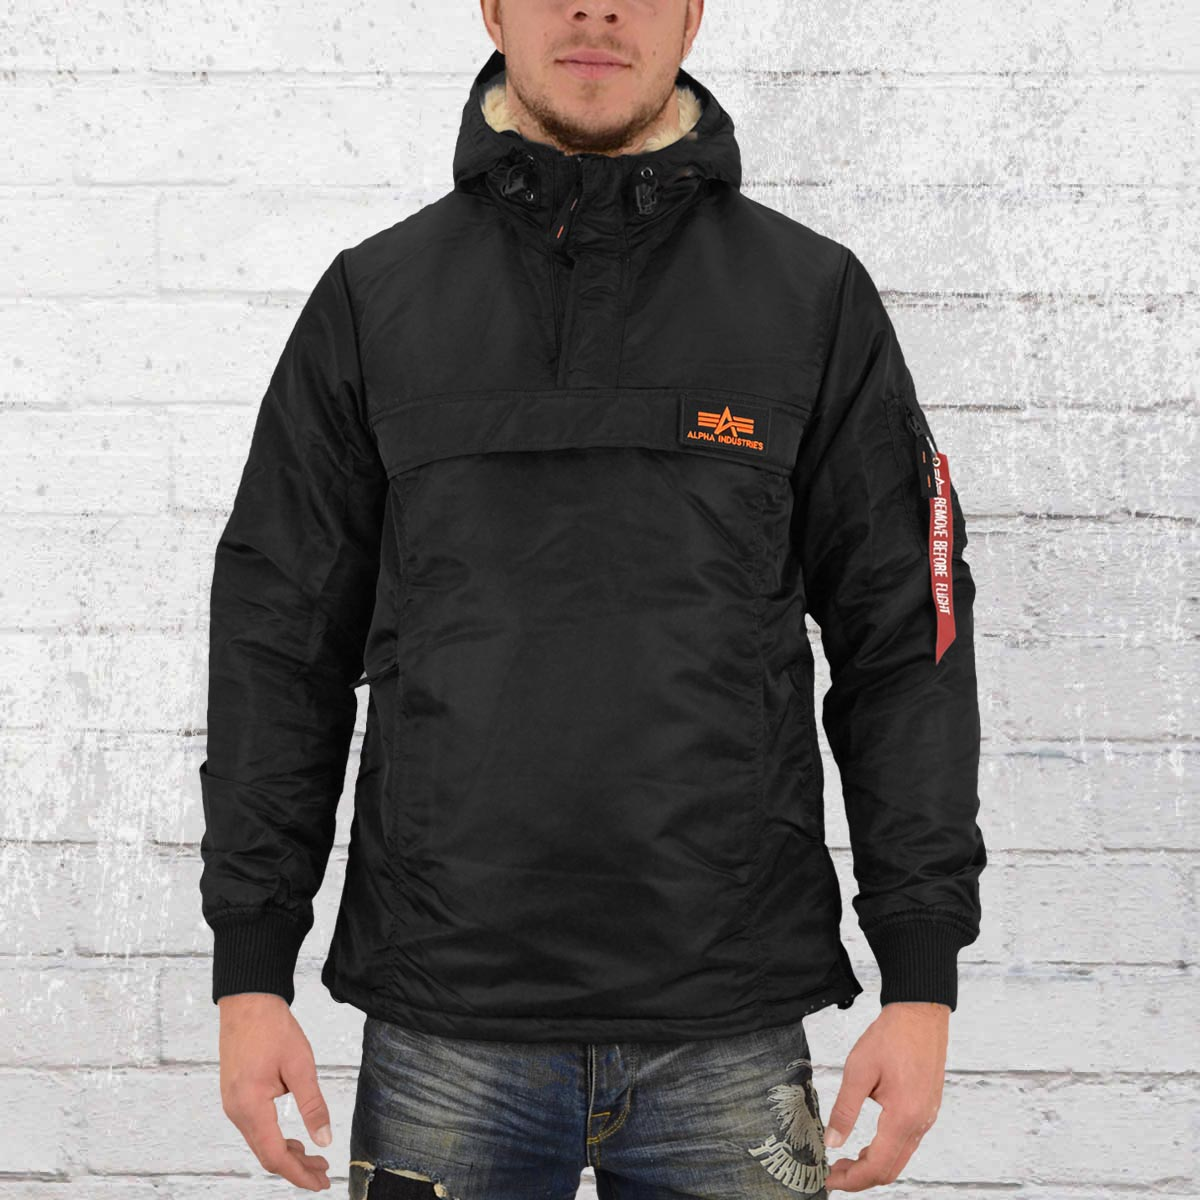 buy online 25469 71479 Order now | Alpha Industries Male Windbreaker HPO Anorak black